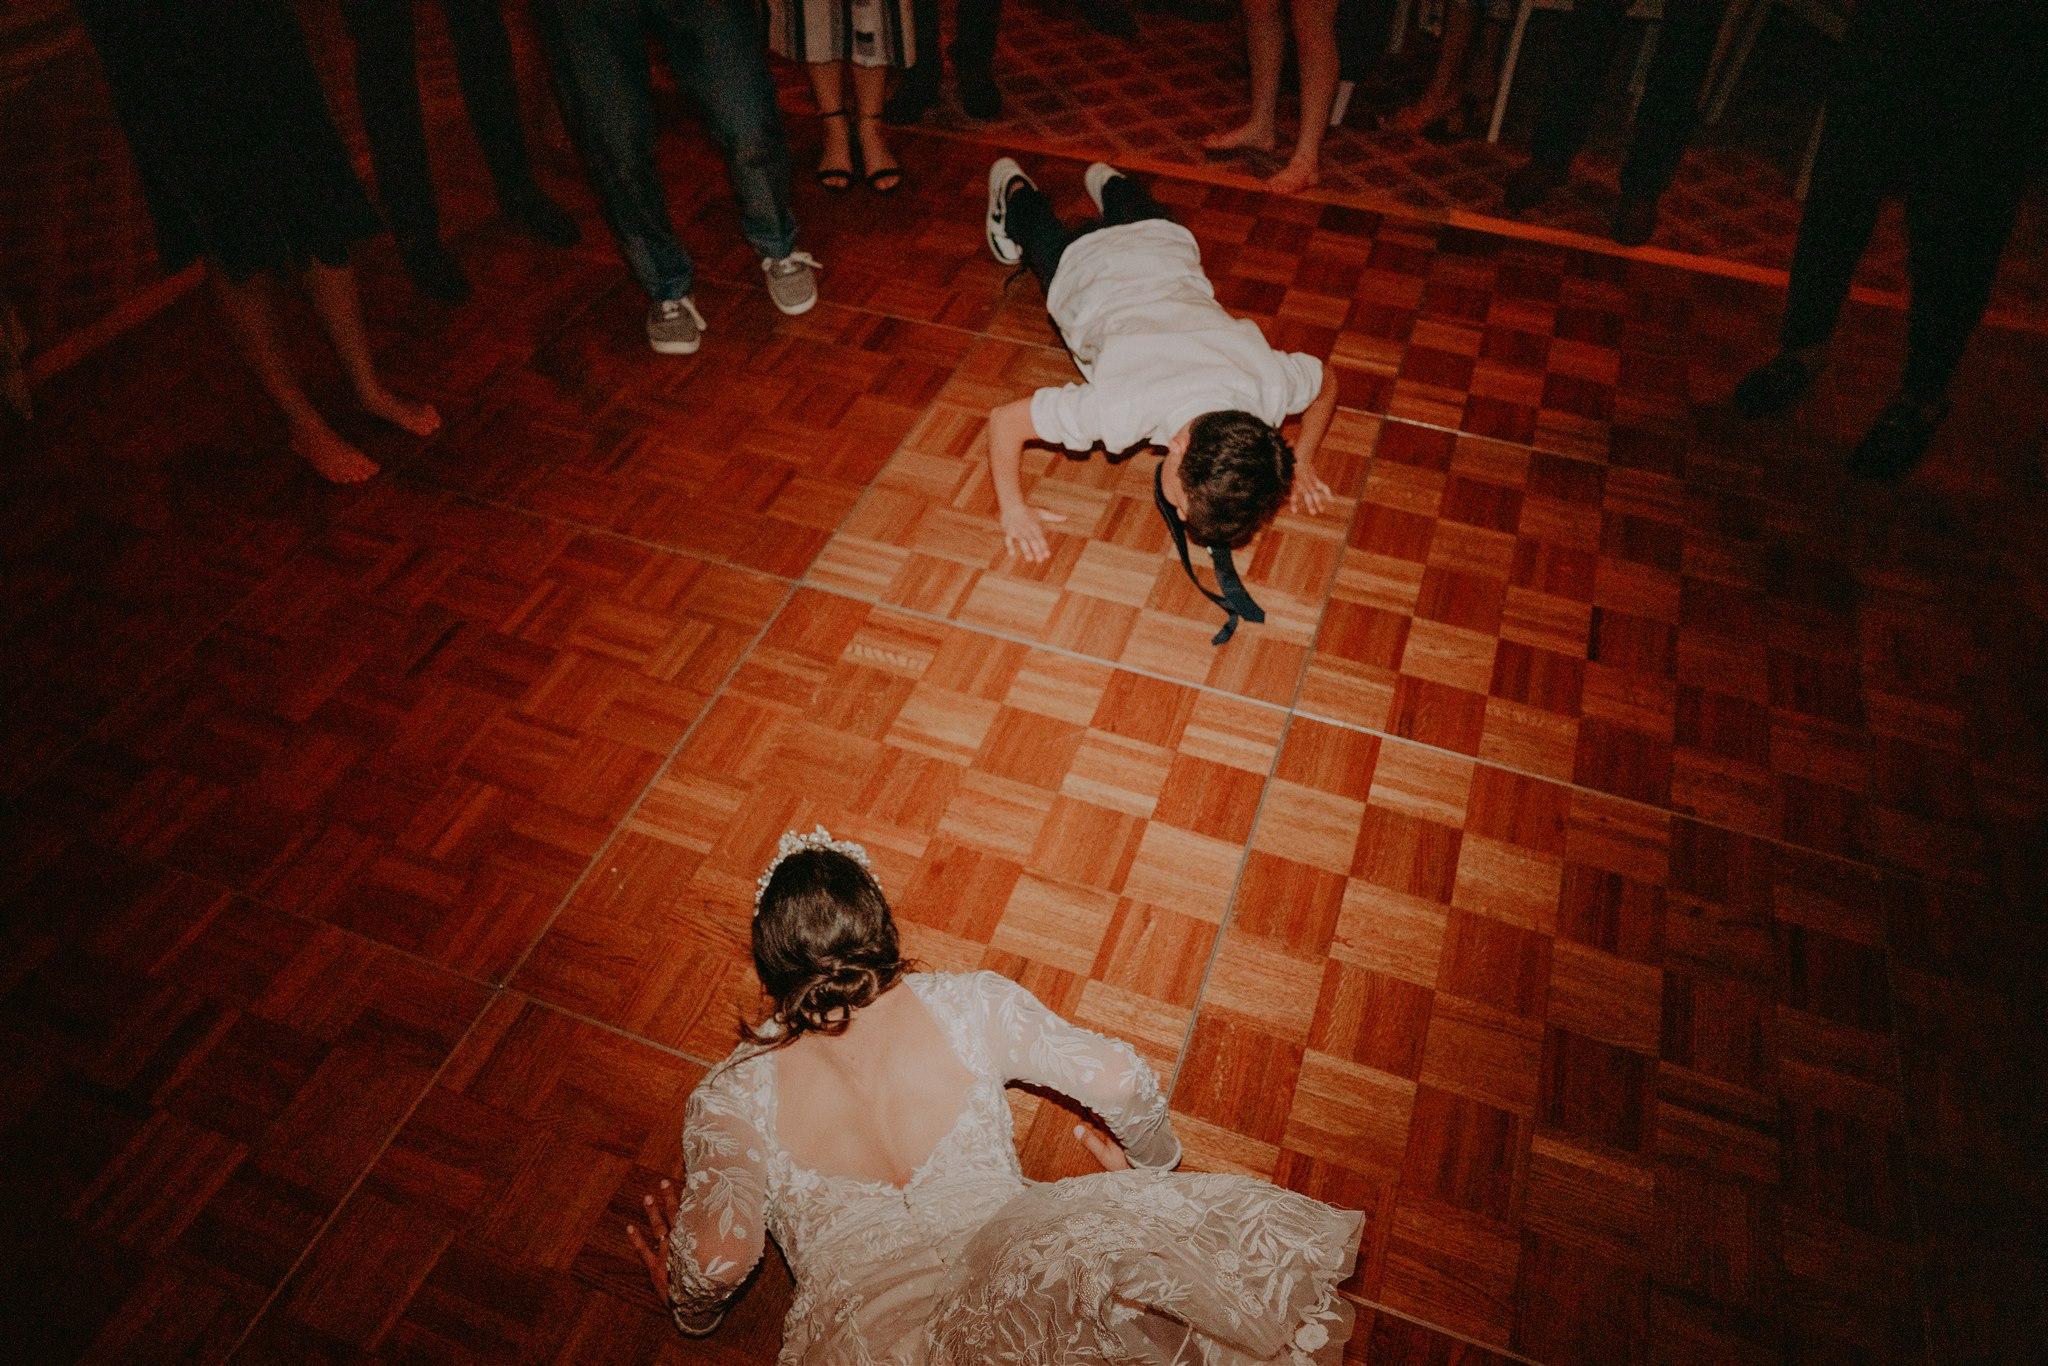 Chellise_Michael_Photography_Hudson_Valley_Wedding_Photographer_Otesaga_Hotel-6232.jpg